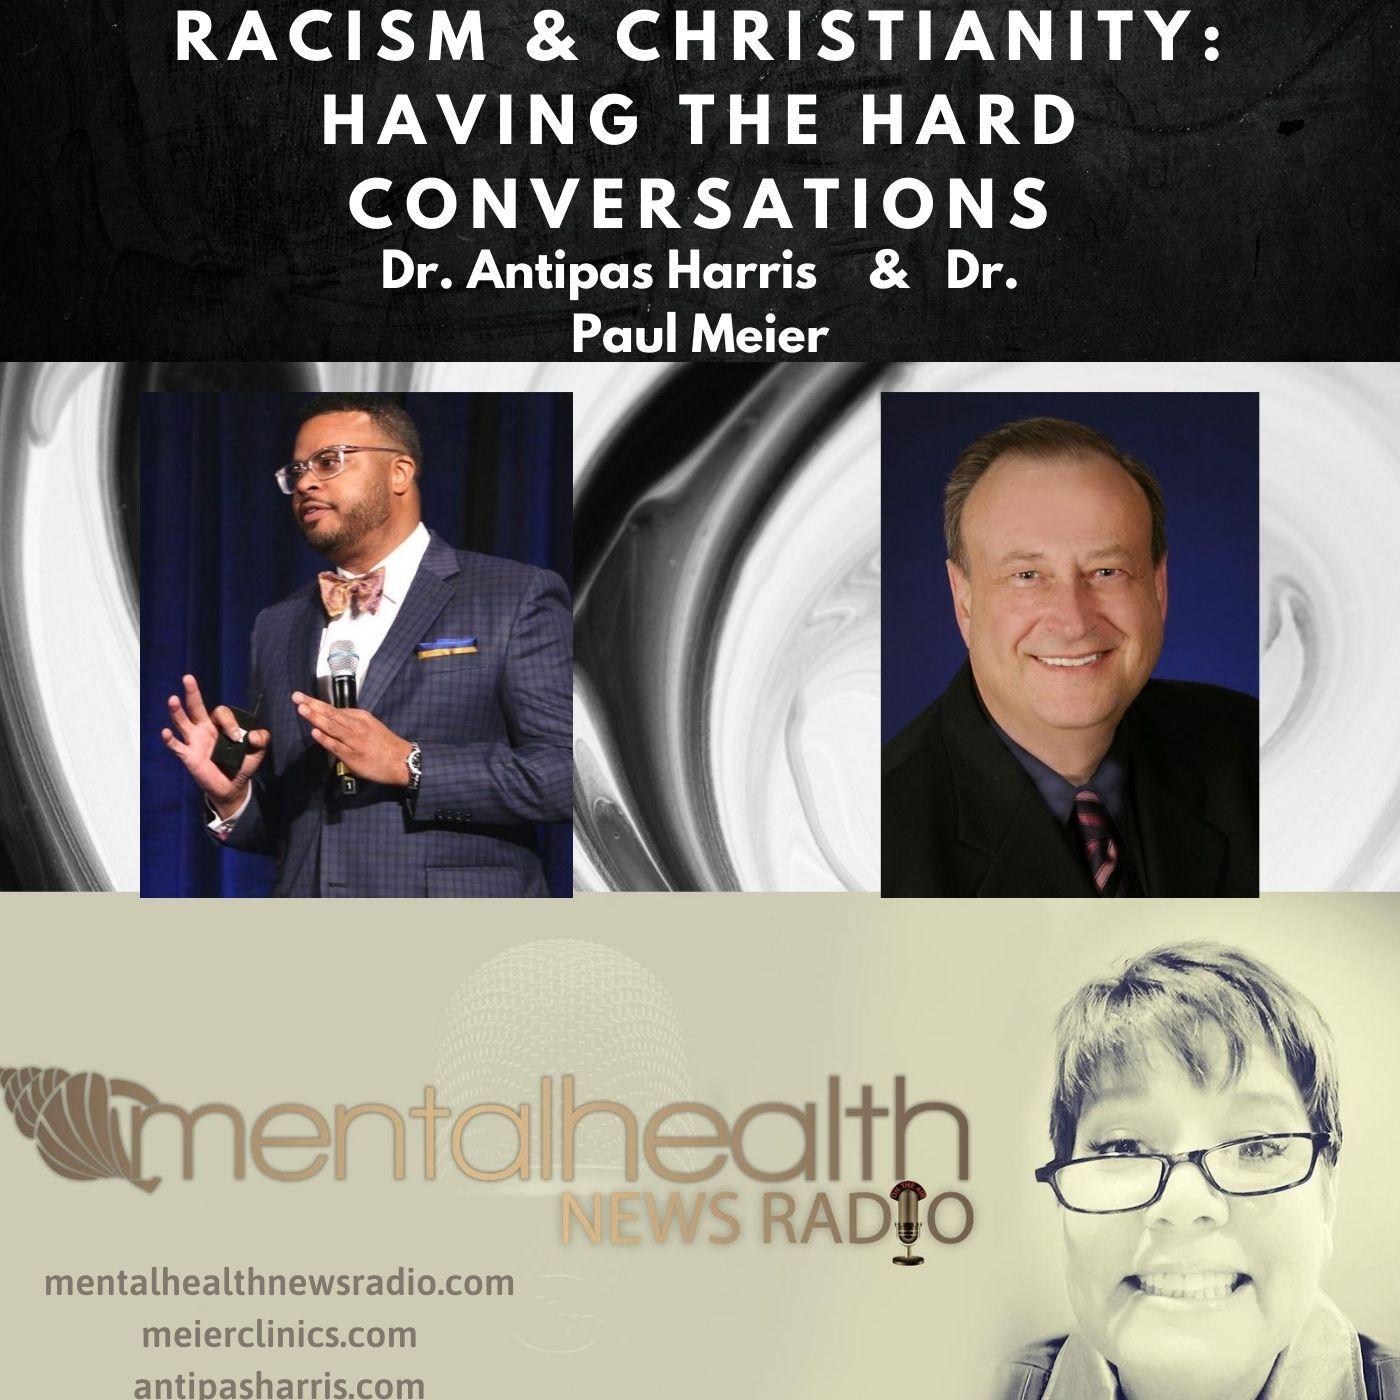 Mental Health News Radio - Racism and Christianity:  Having the Hard Conversations